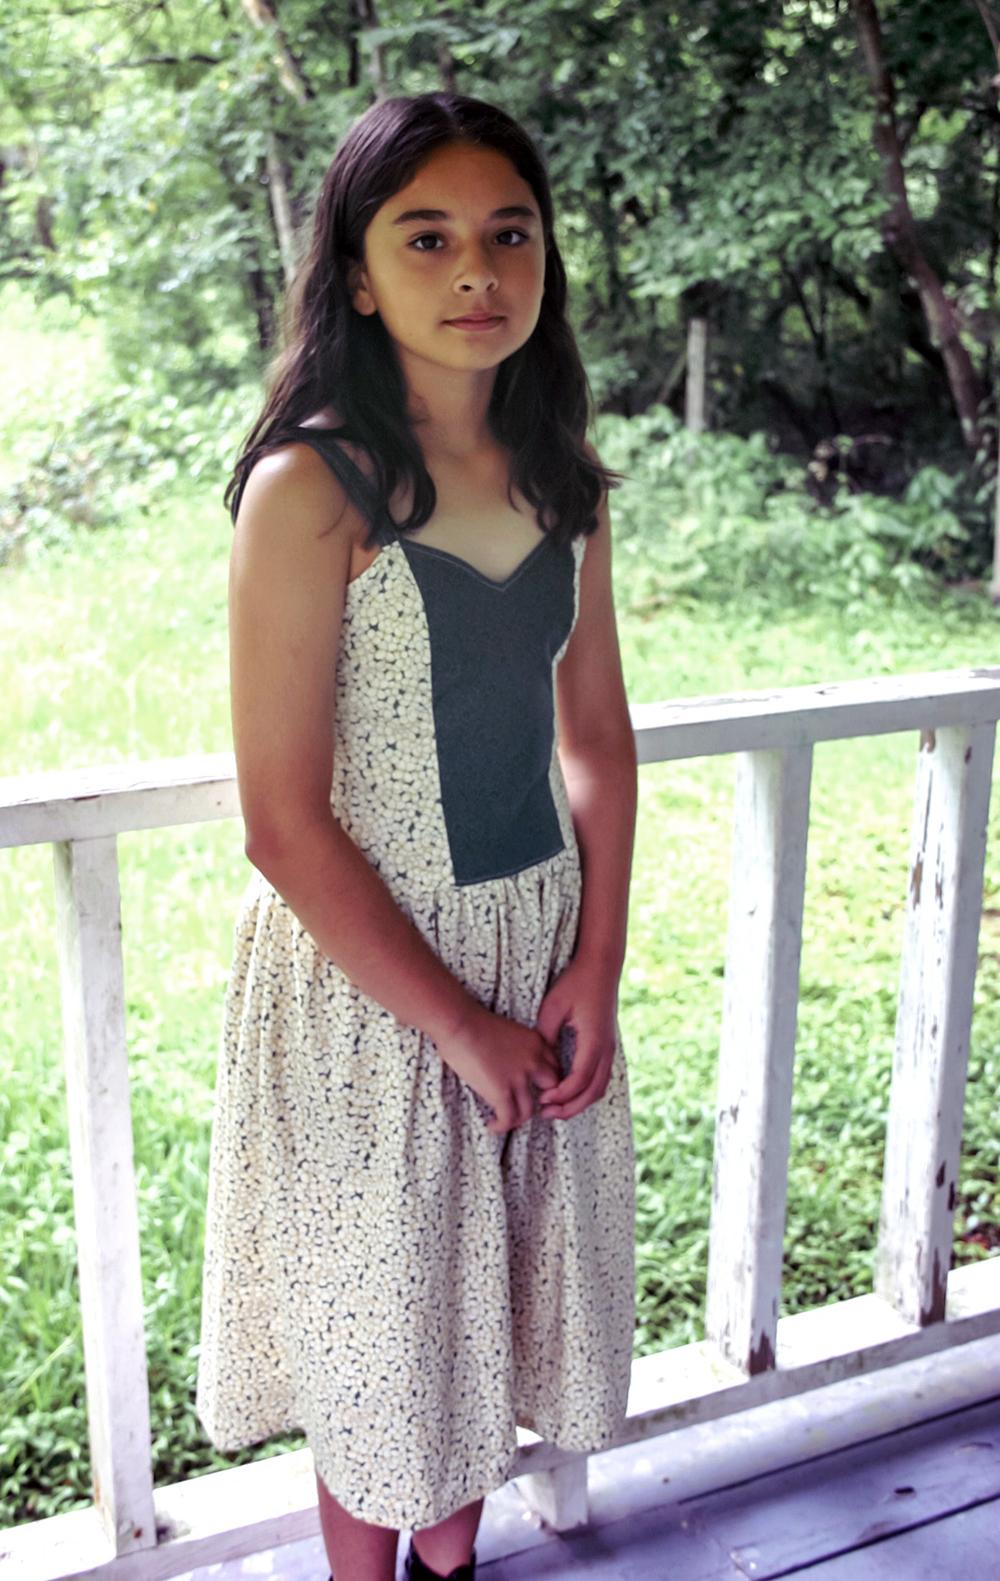 Liberty's Culottes Romper Sizes XXS to 3X Adults PDF Pattern